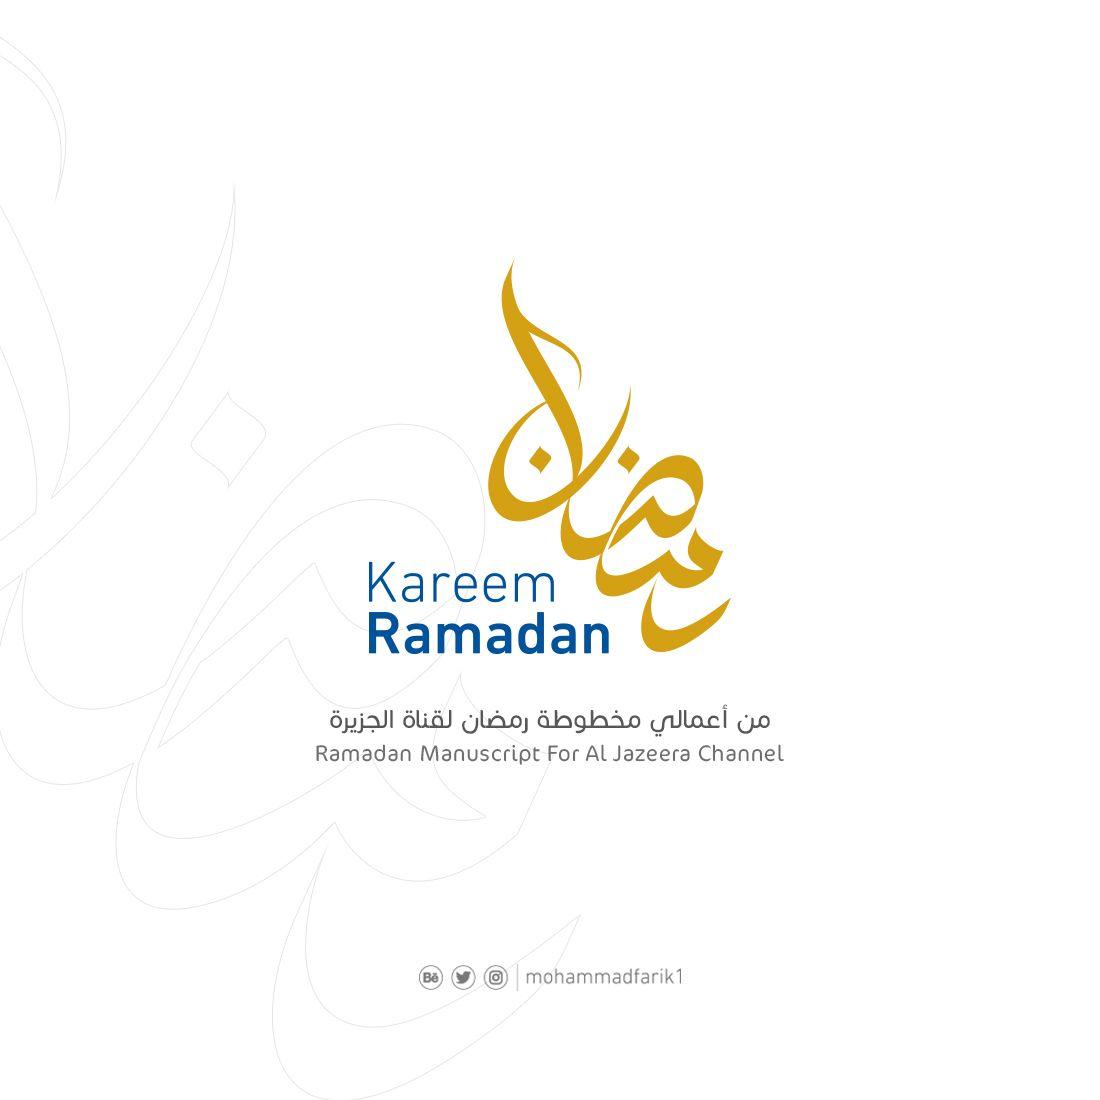 Ramadan Calligraphy Script For Al Jazeera Corporation By Mohammad Farik Mohammadfarik محمد فريق الجزيرة قناة الجزيرة Ramadan Ramadan Png Logo Inspiration